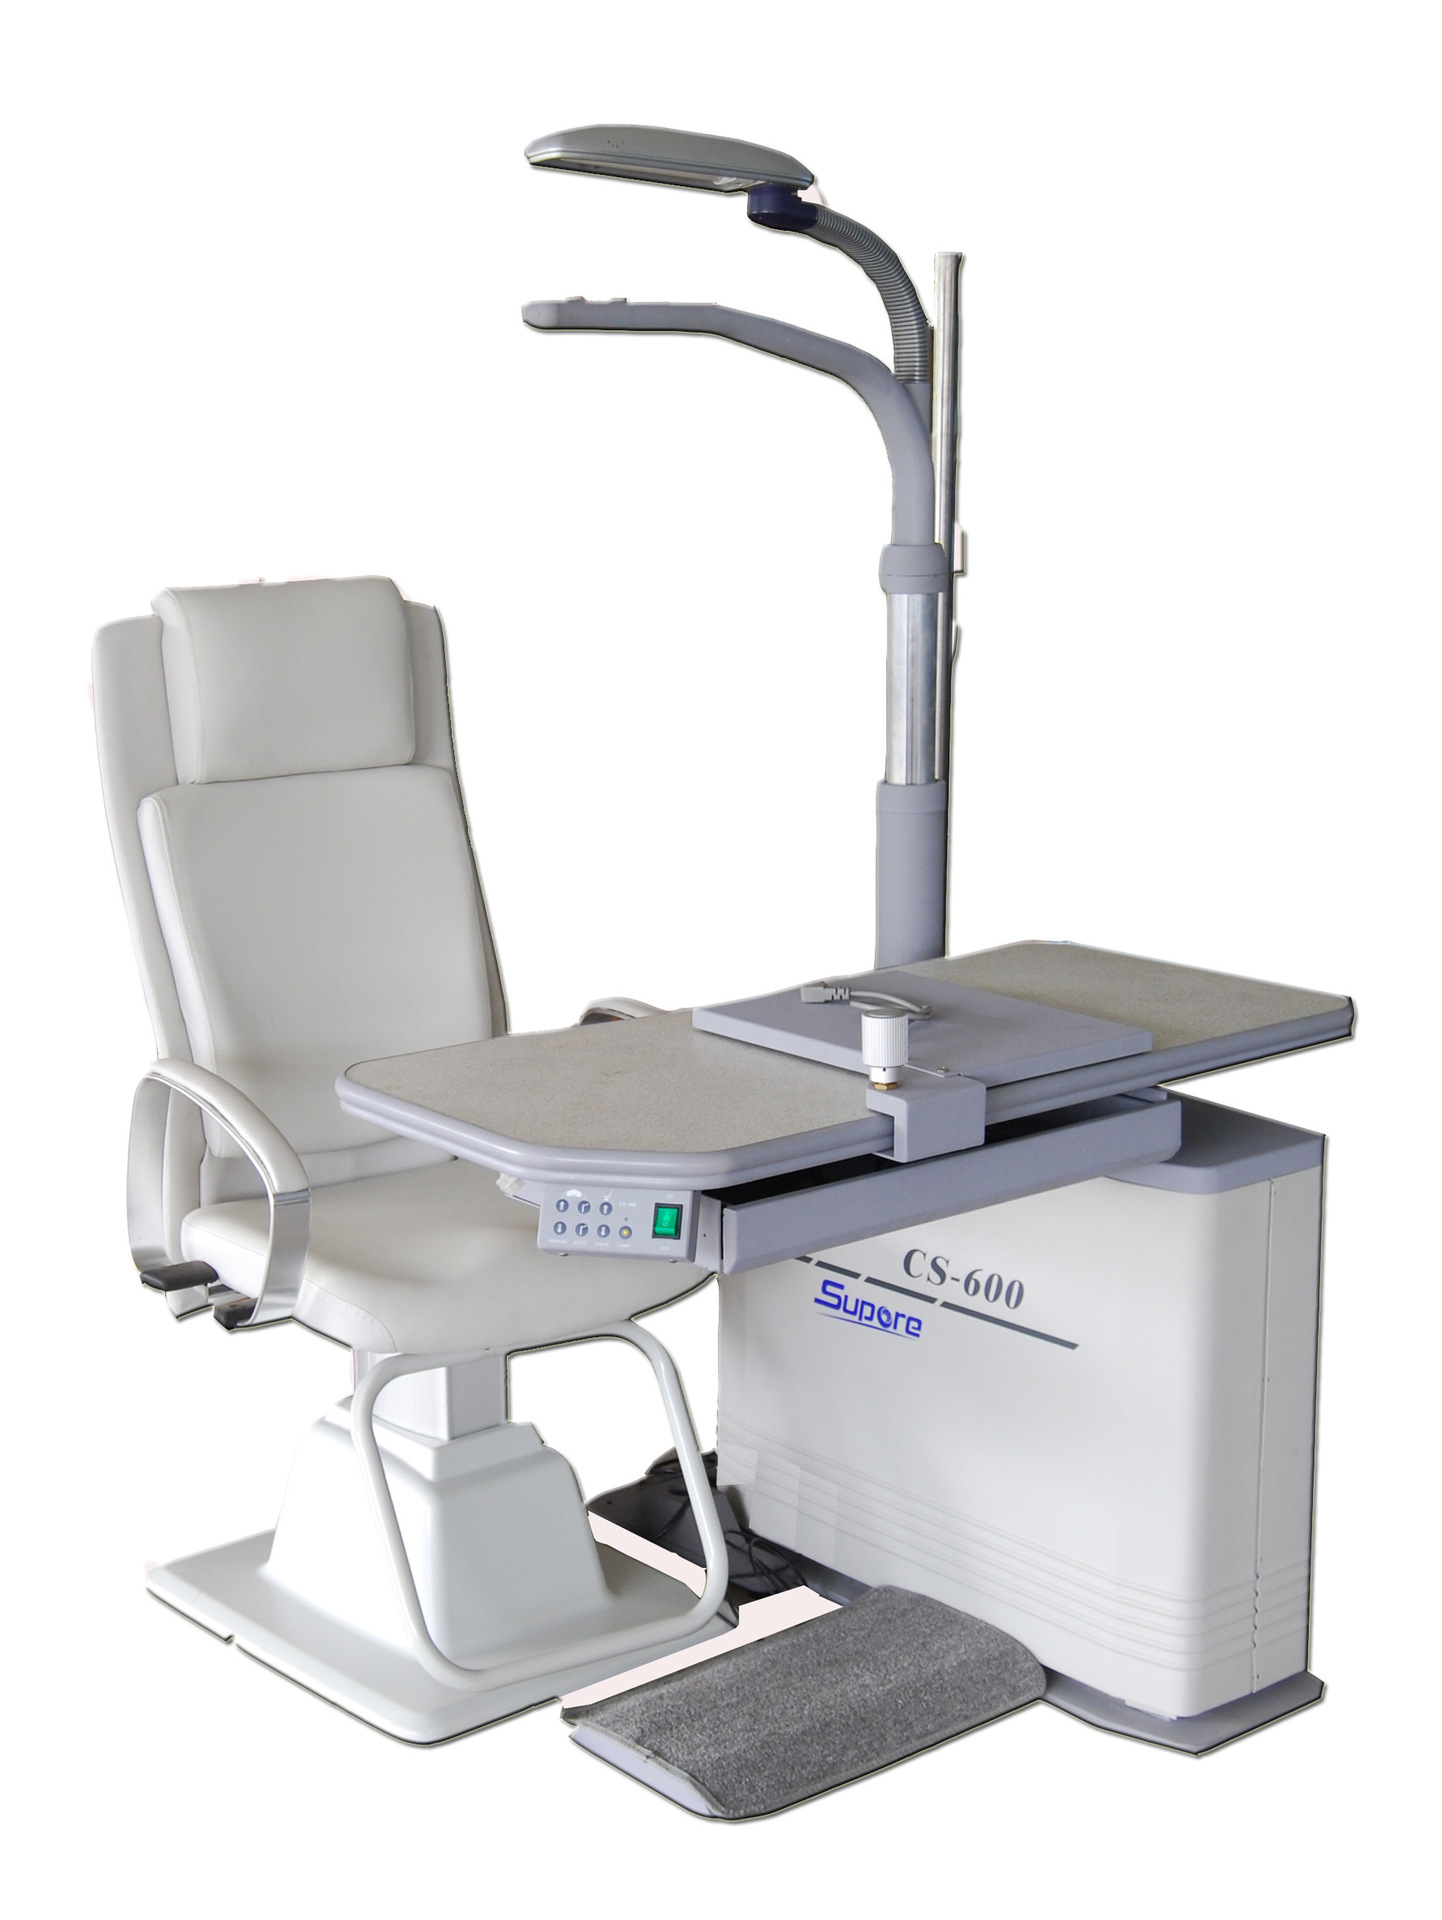 Optics eyeglasses Clinic CS-600 Combined Table,Table Unit